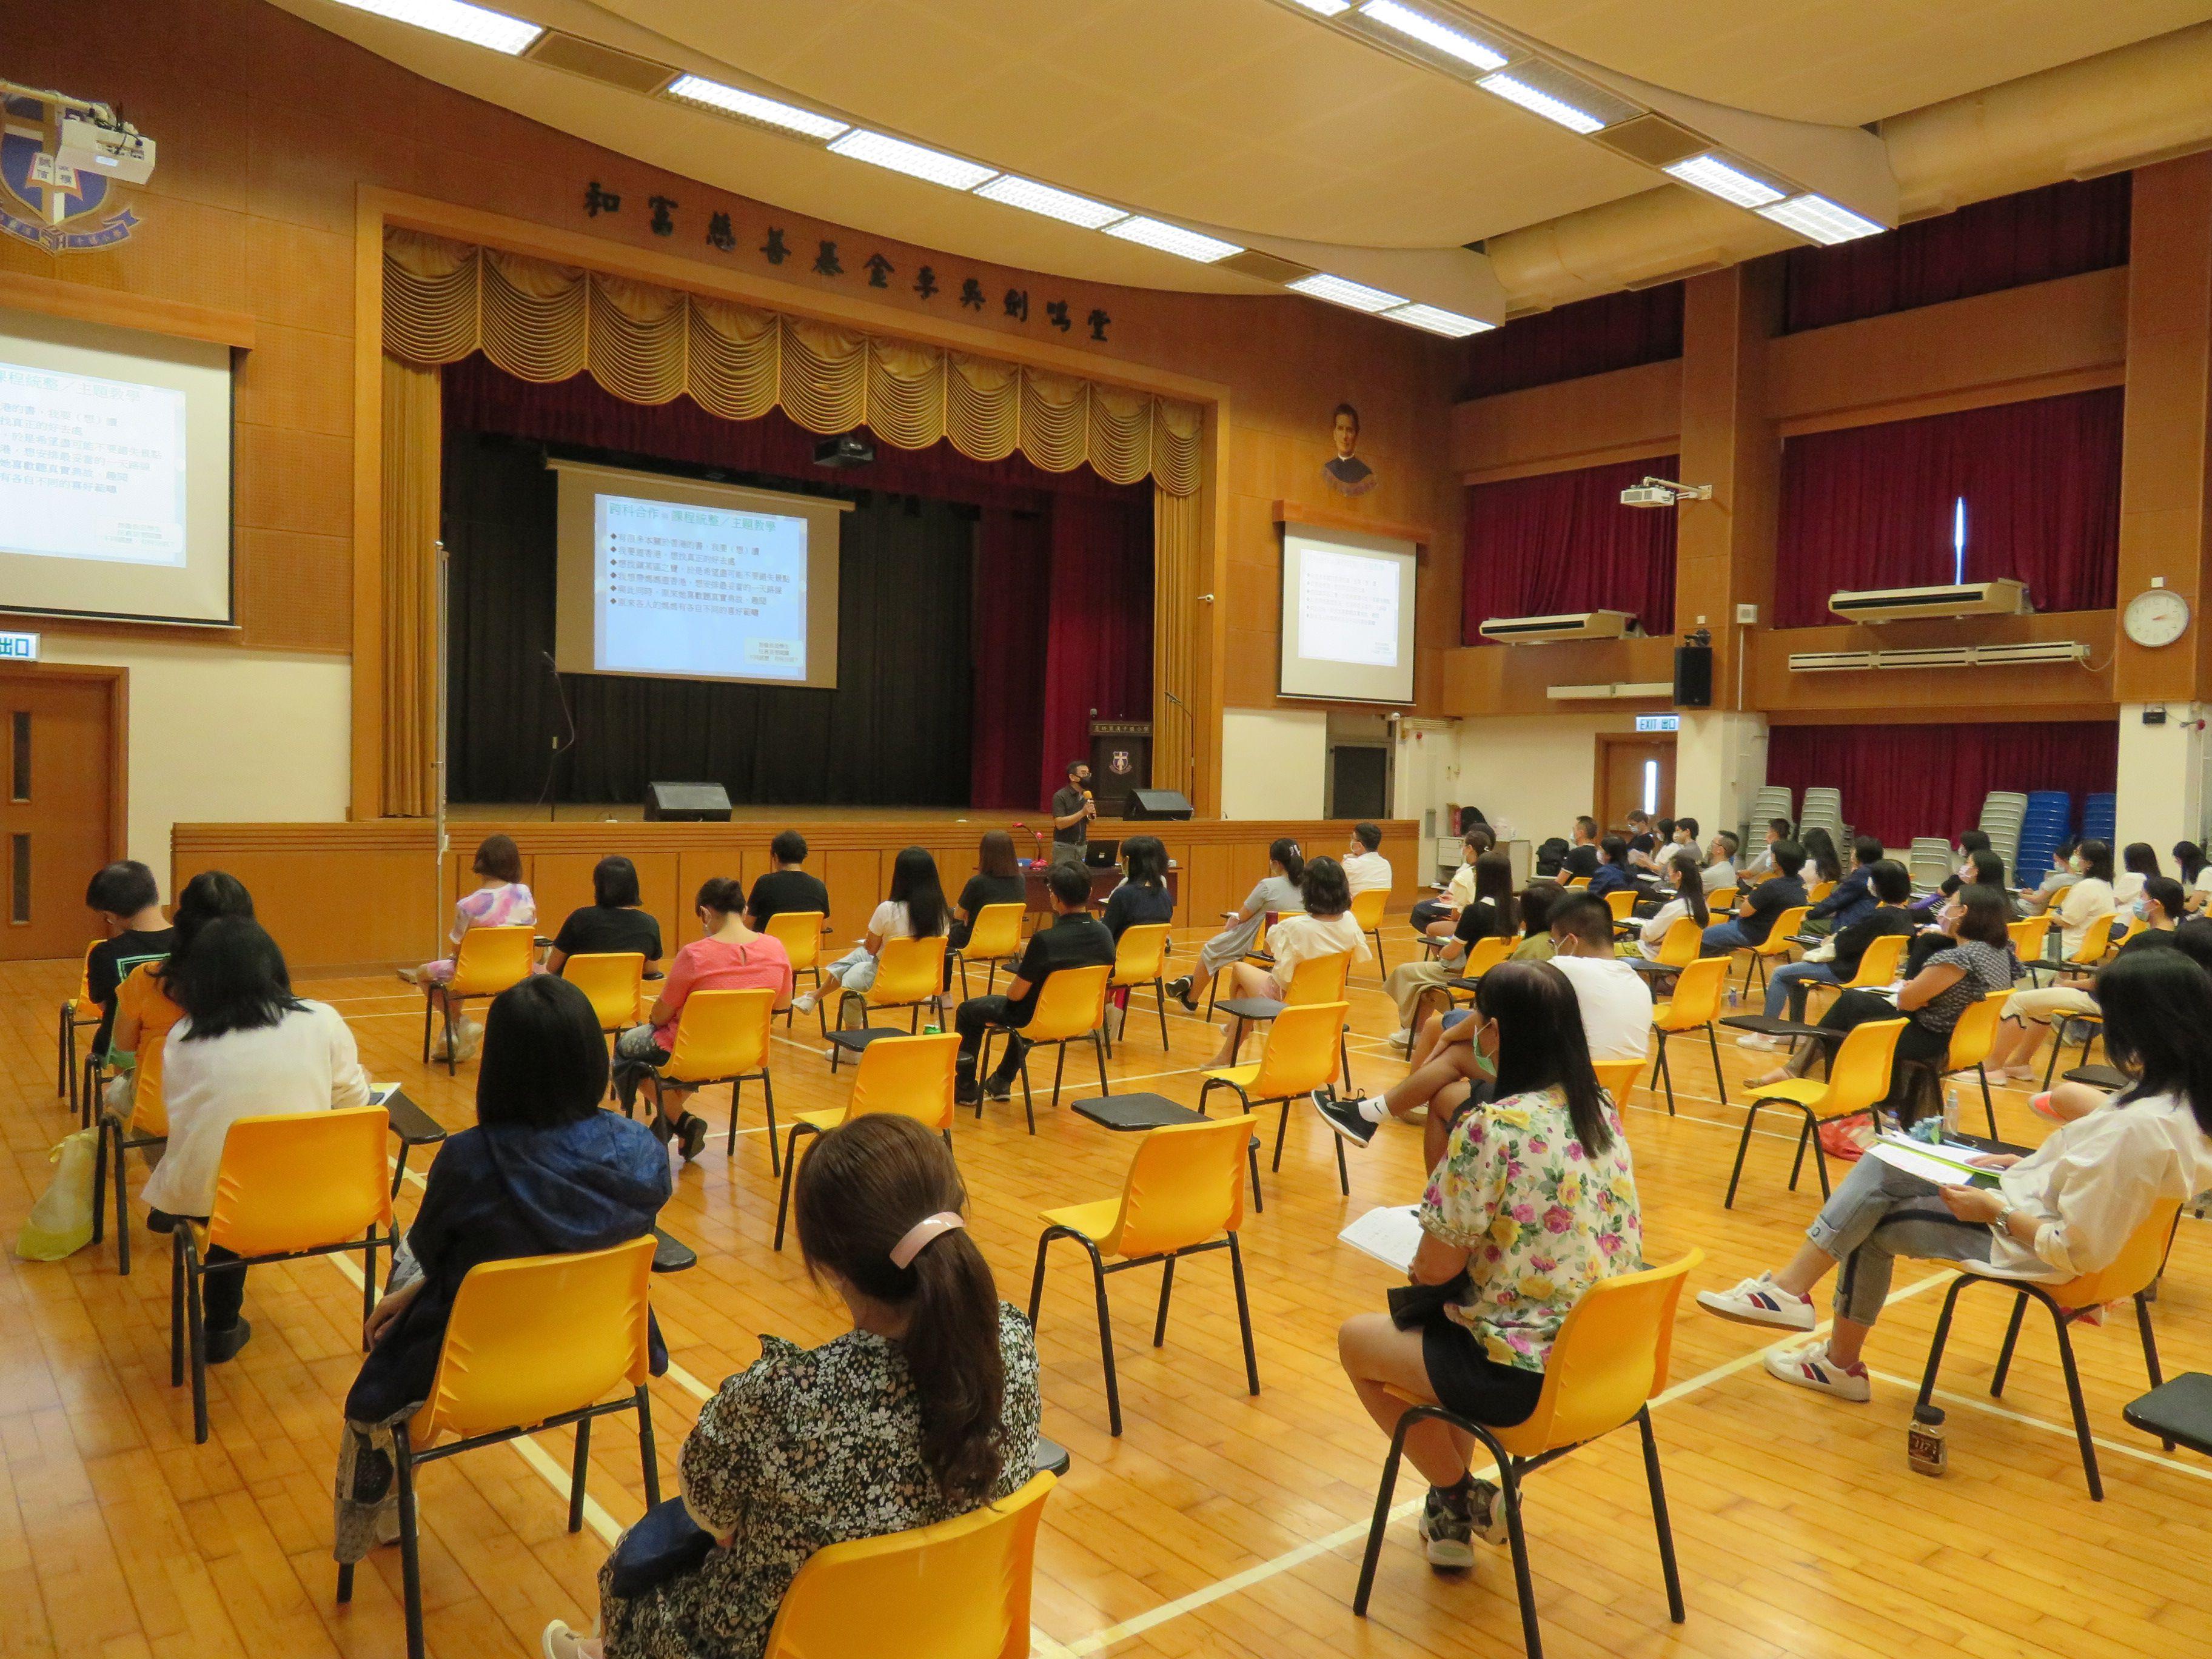 https://syh.edu.hk/sites/default/files/img_0460_1.jpg